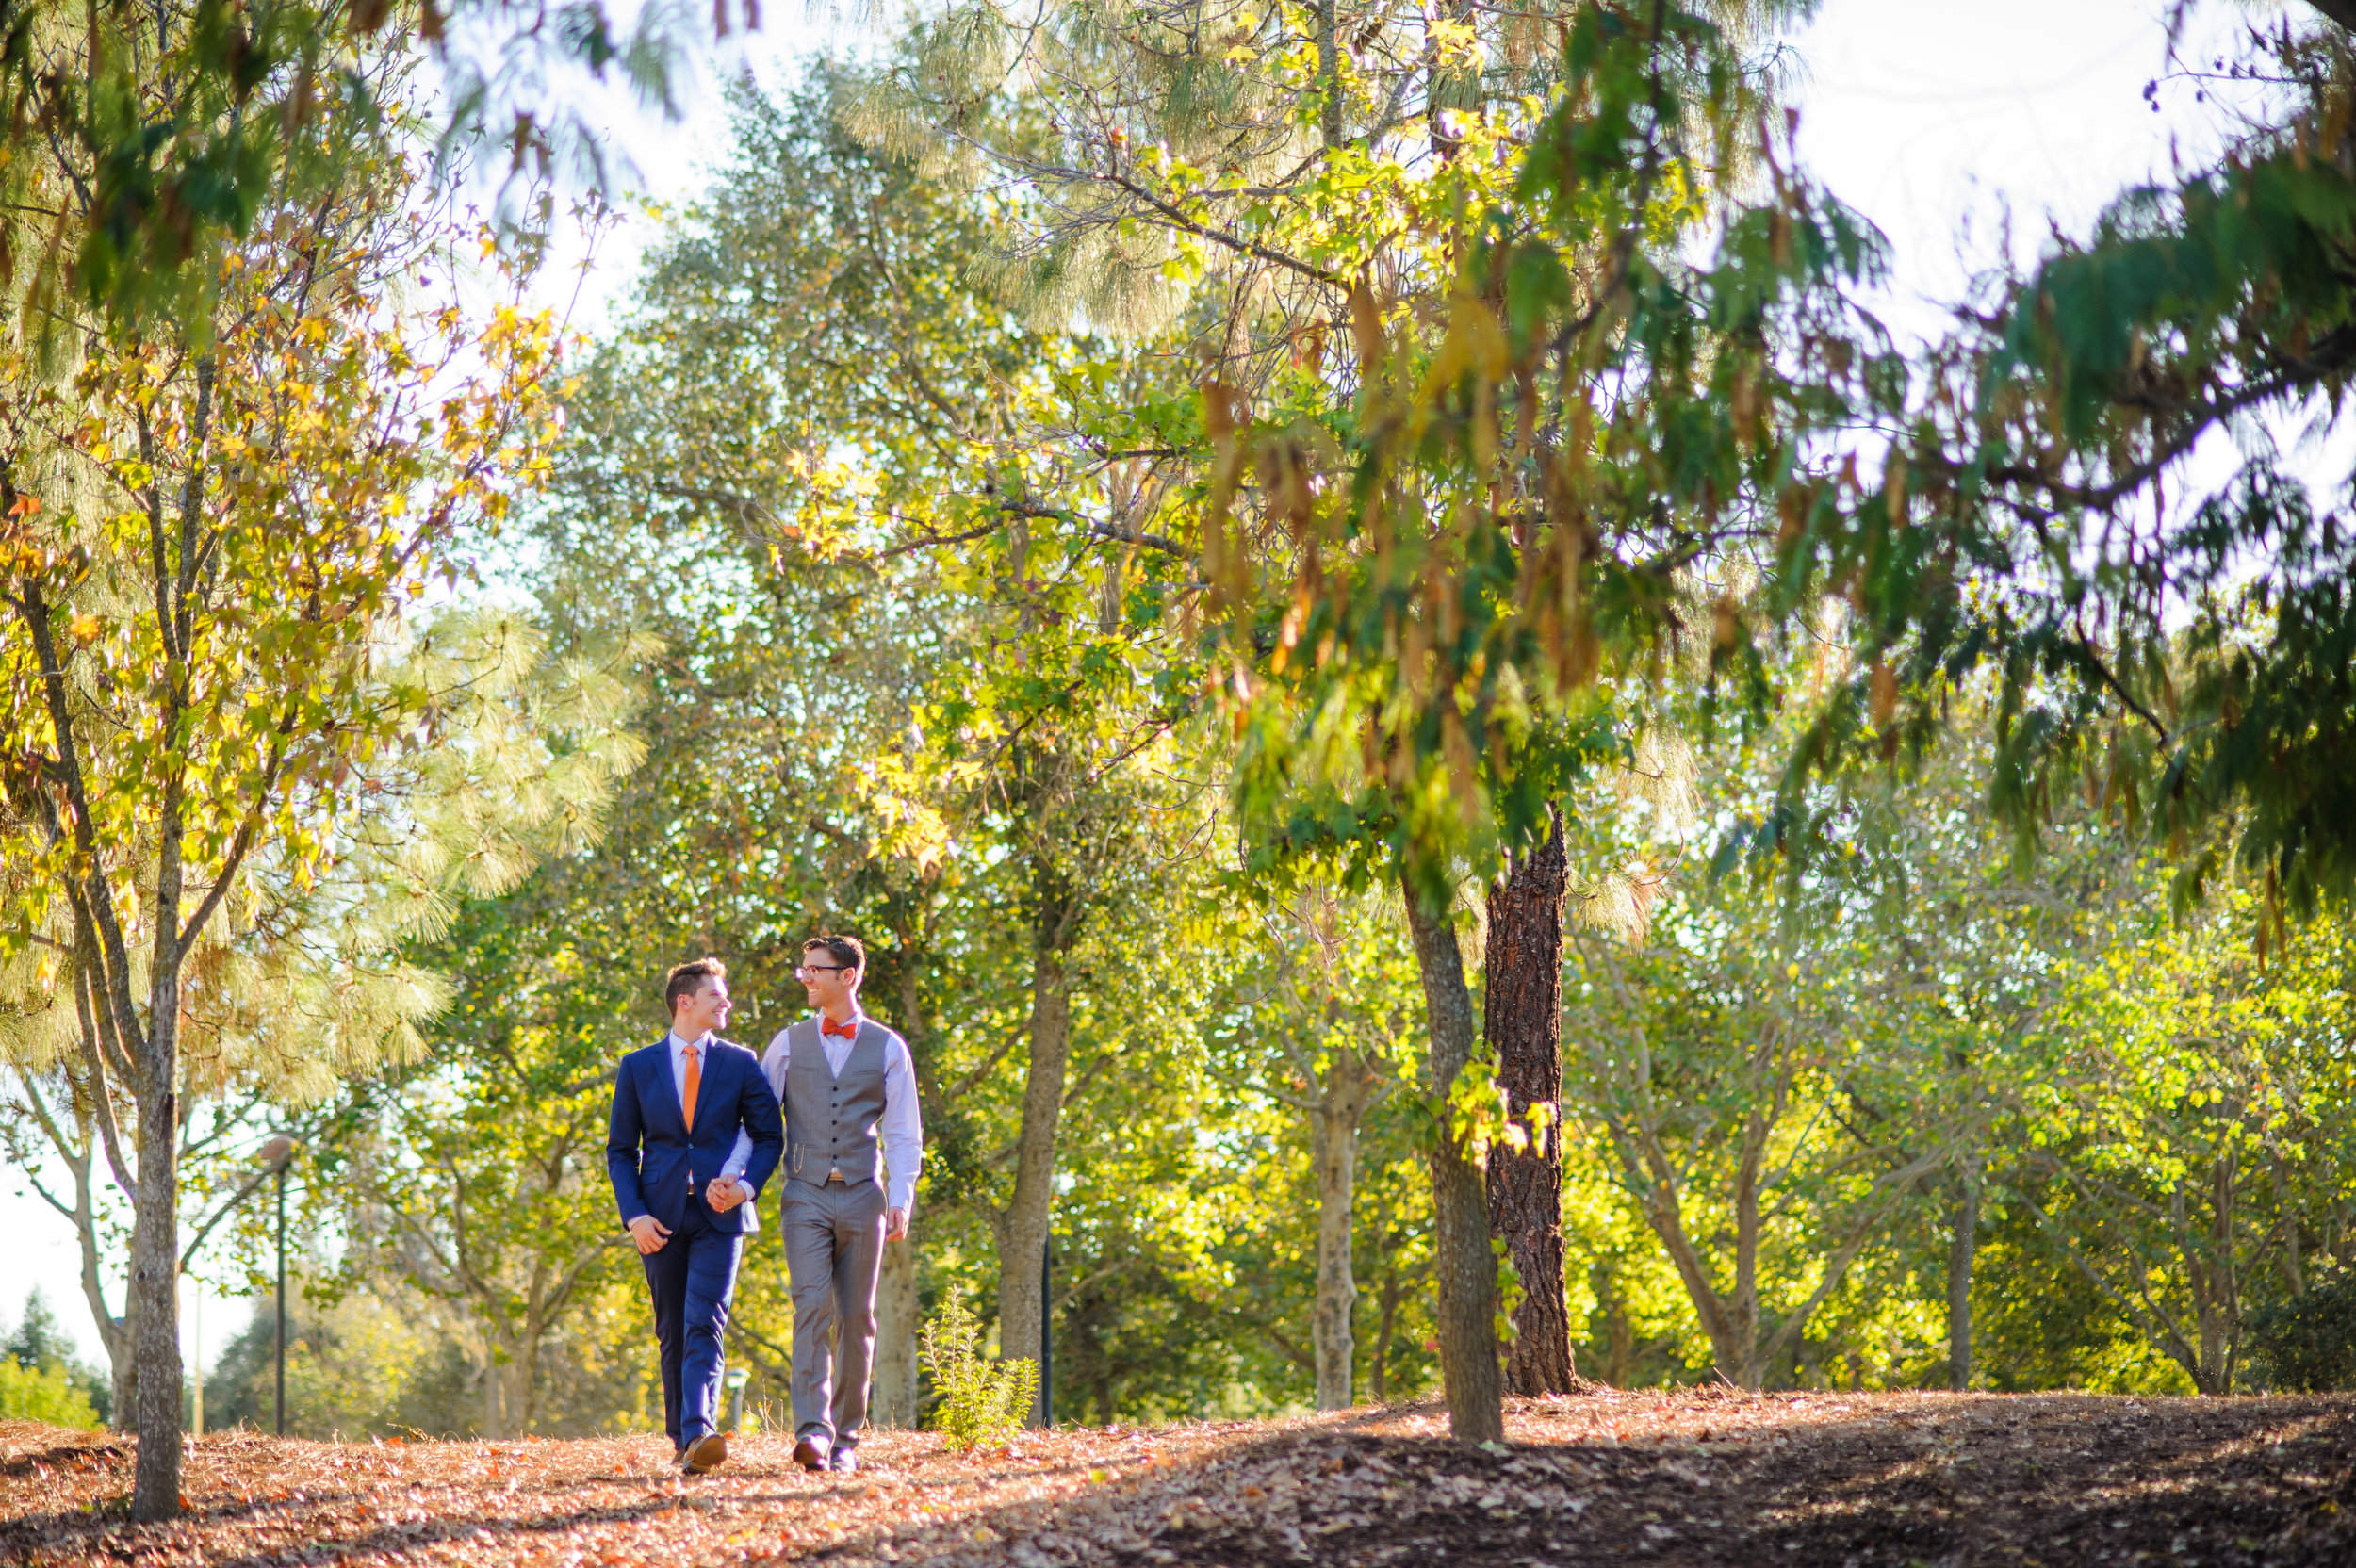 josh-parker-021-same-sex-sacramento-wedding-photographer-katherine-nicole-photography.JPG